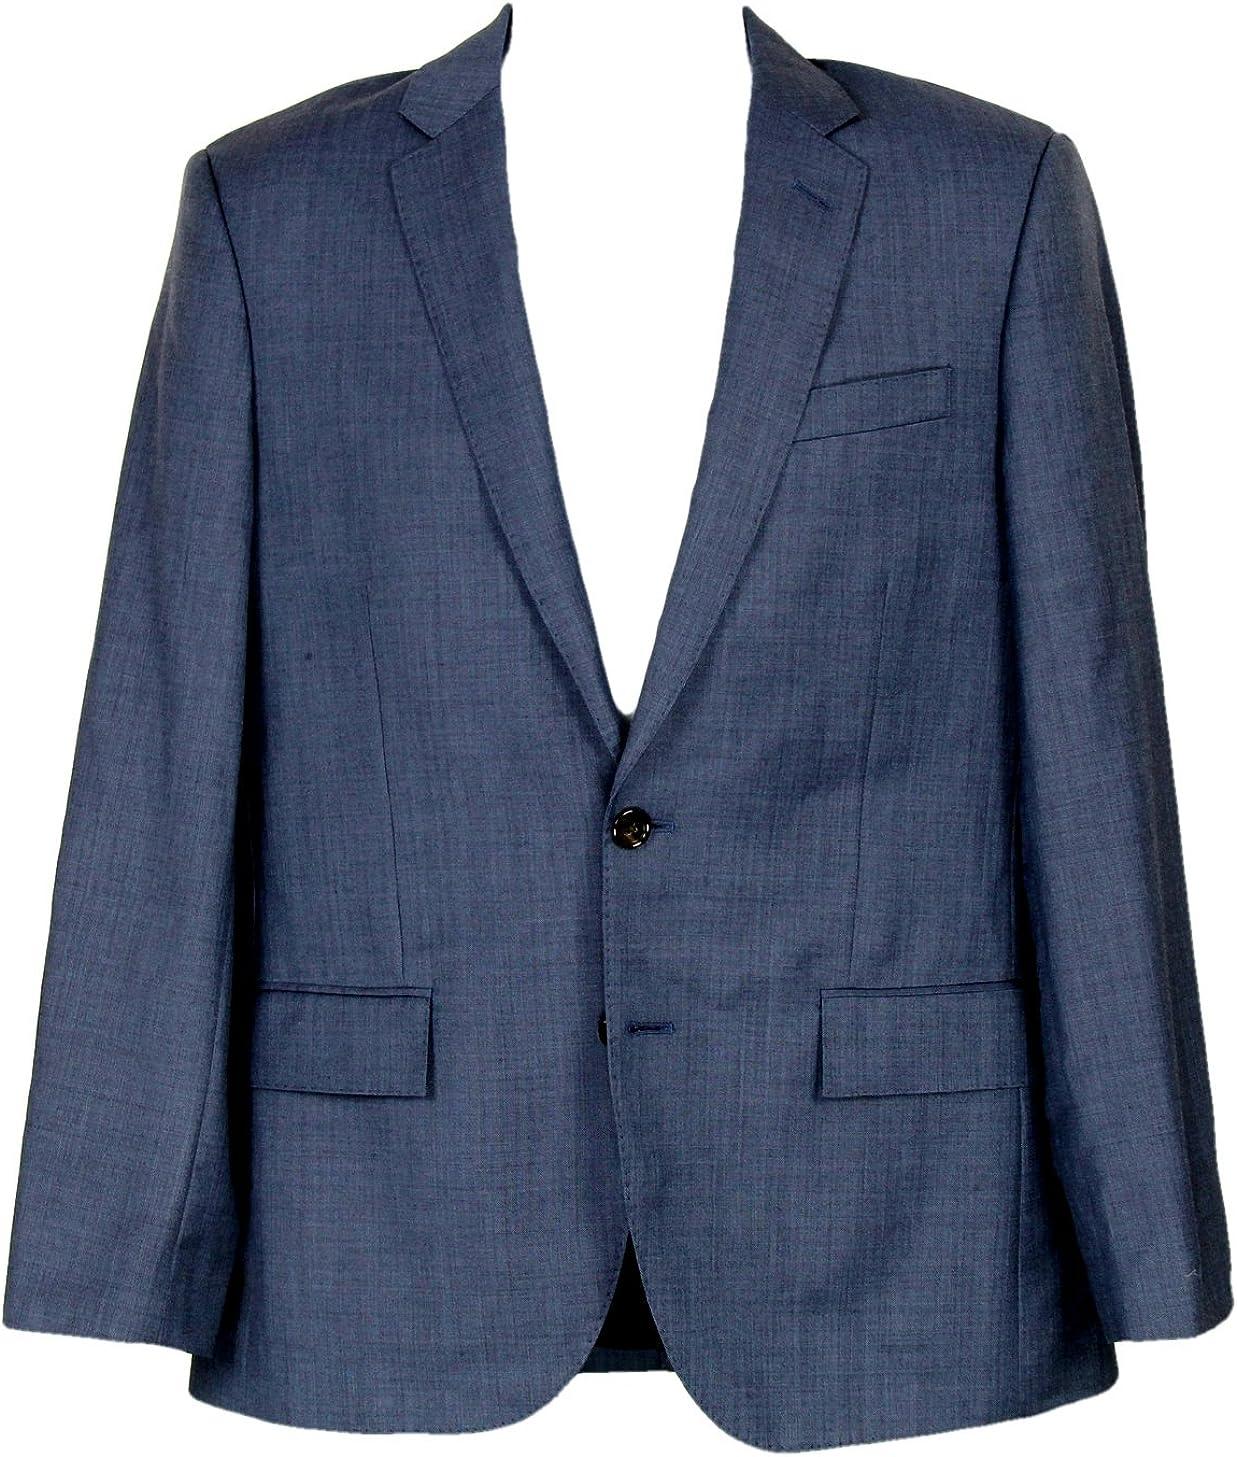 J Crew Ludlow Suit Jacket Double Vent Italian Worsted Wool 38R 11707 Harbor Blue